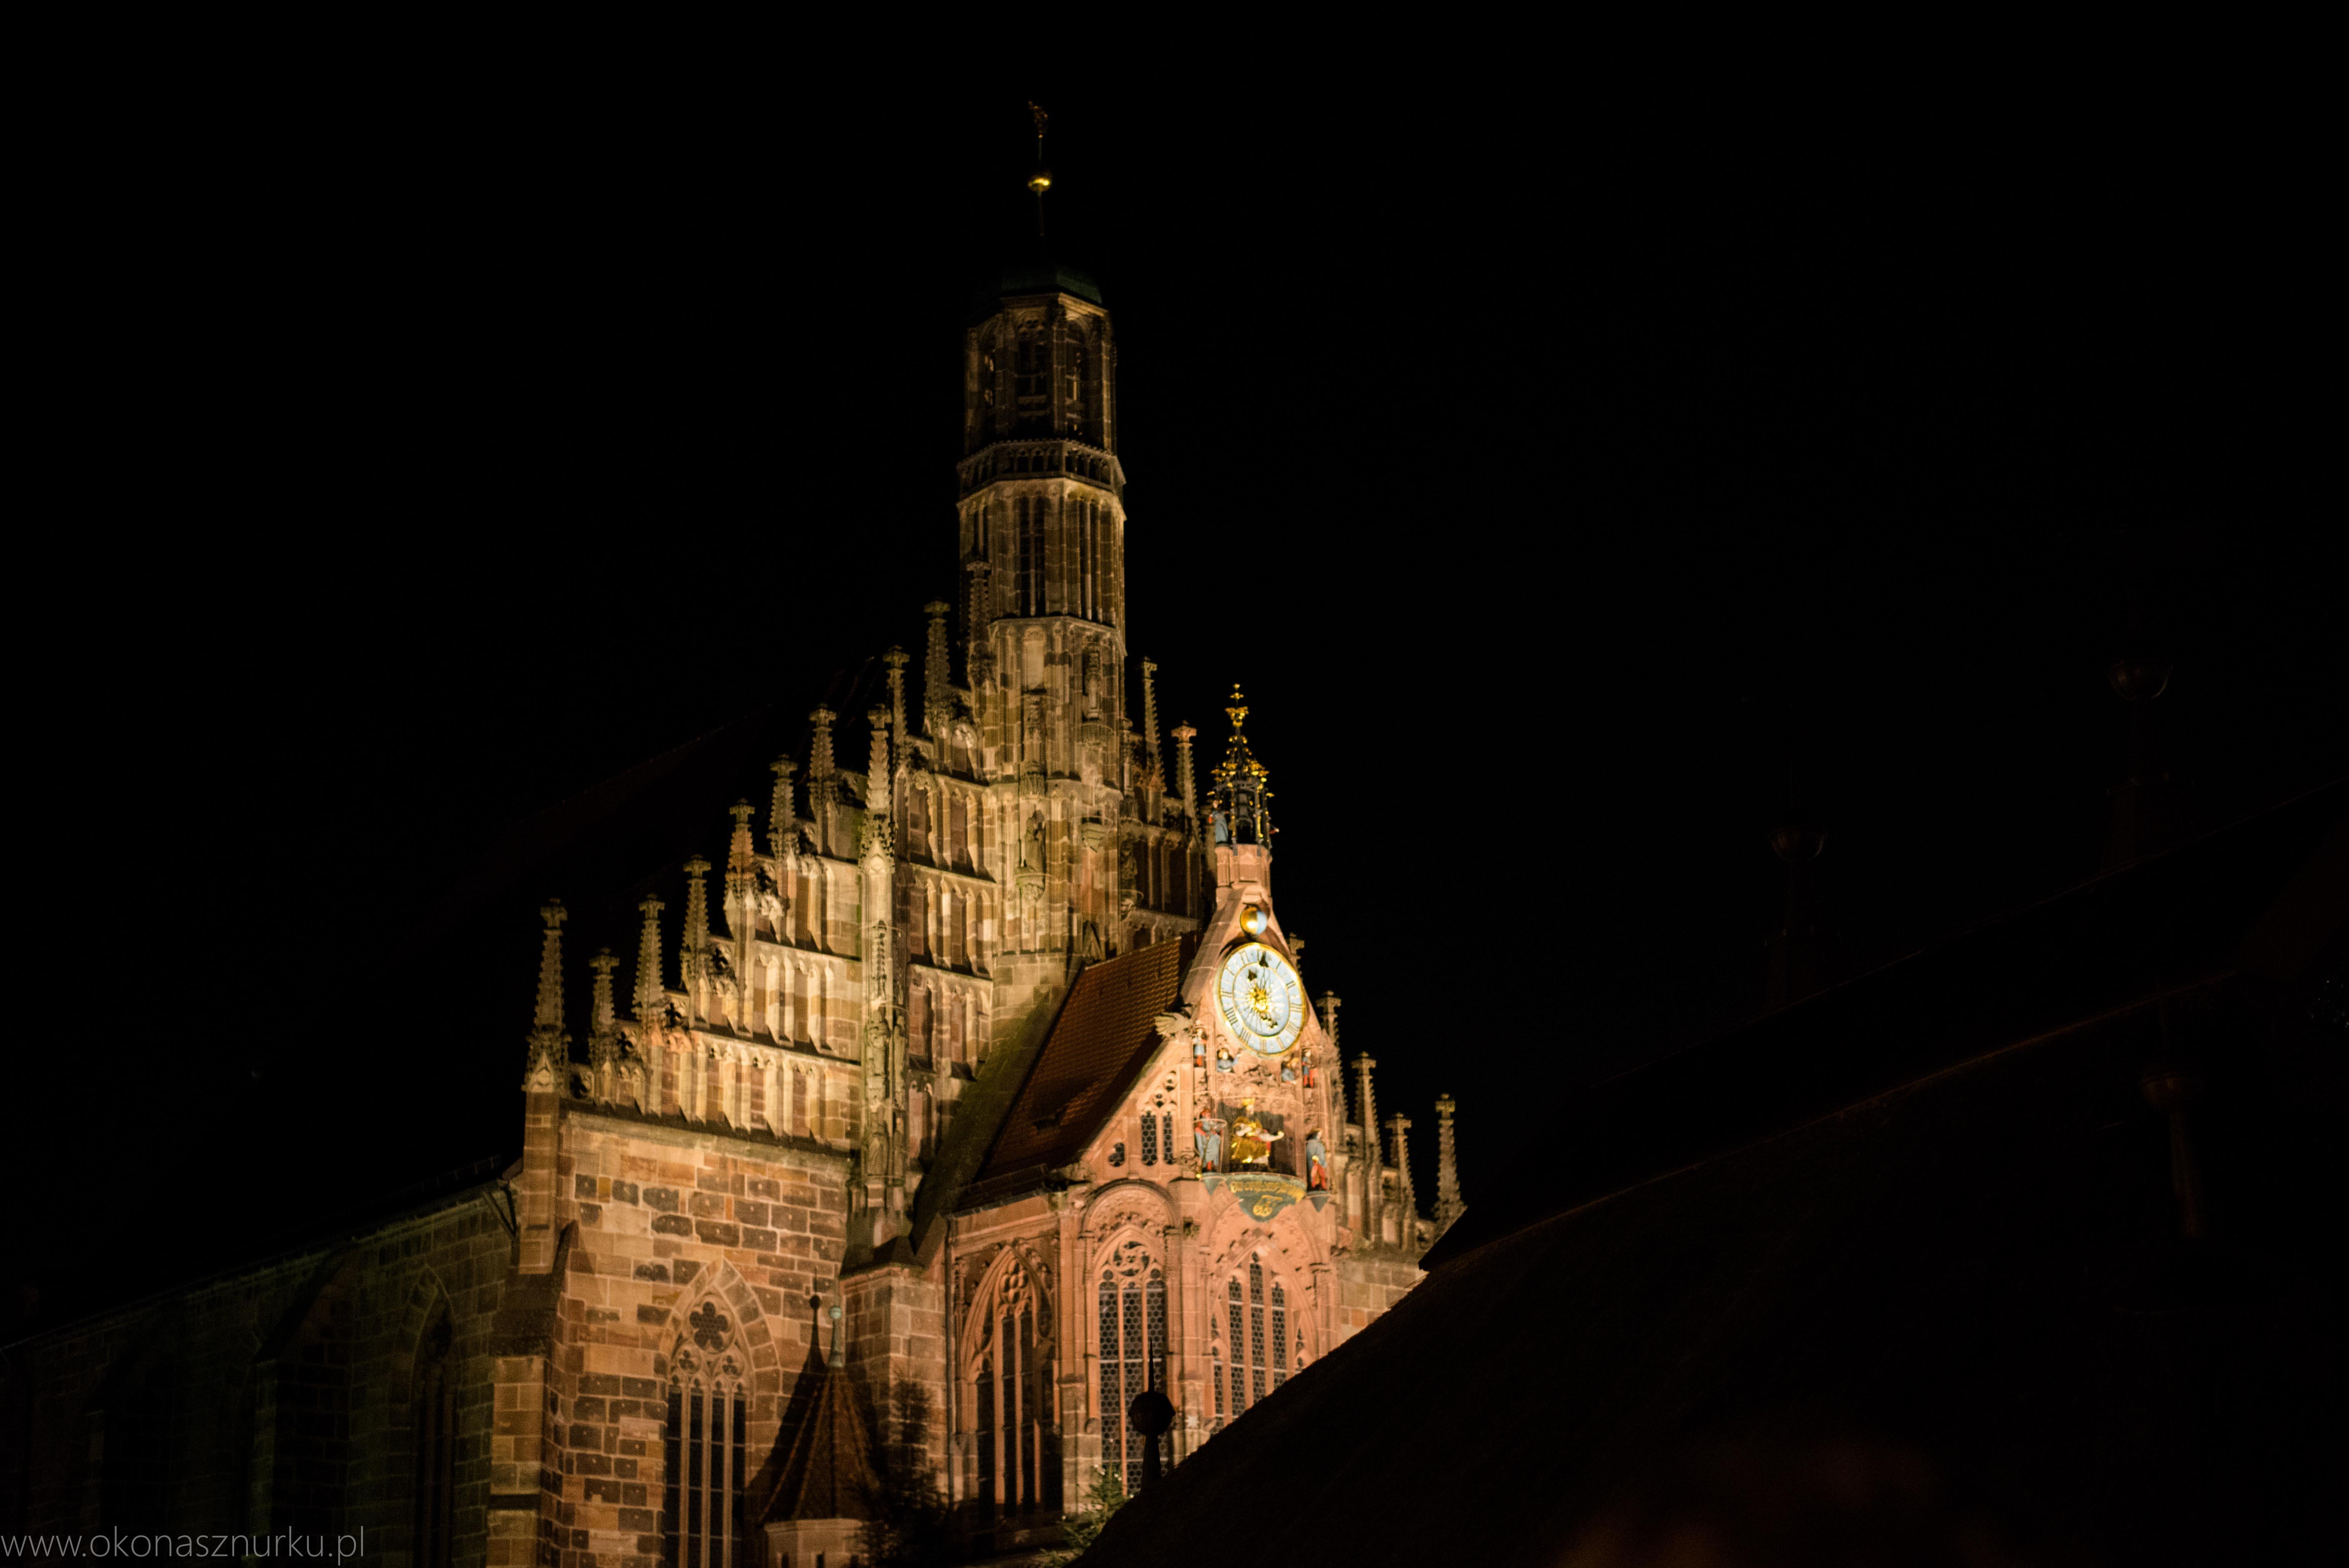 Nürnberg-stadt-norymberga-bayern-city-frankonia (37)